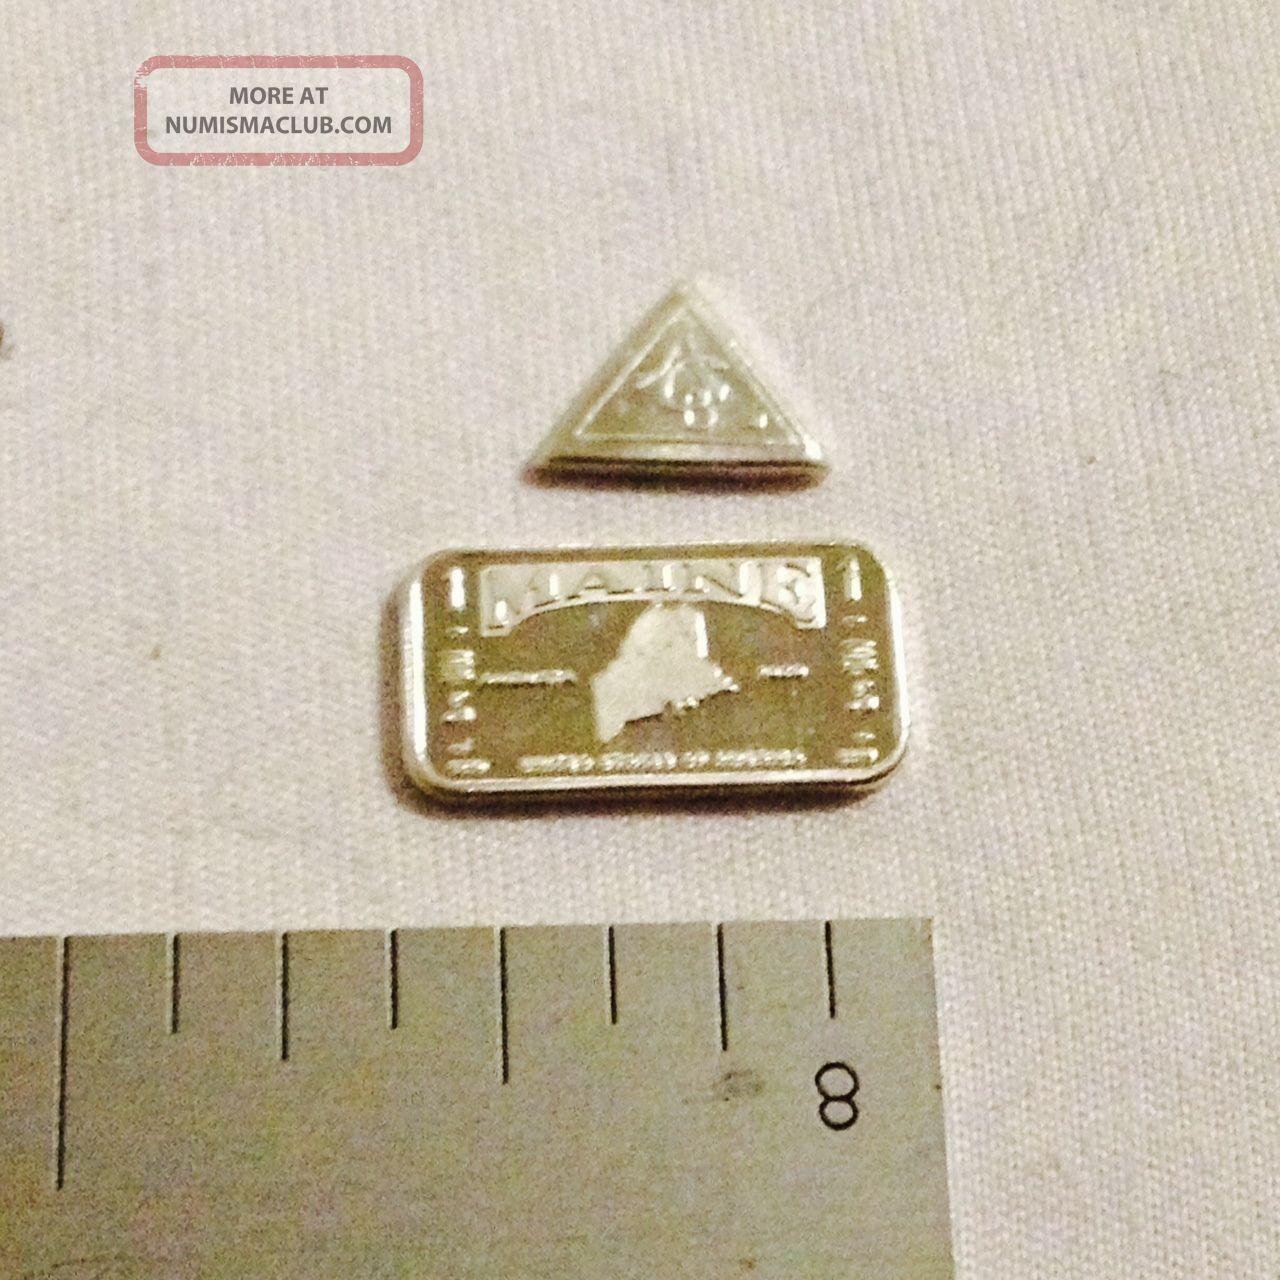 1.  313 Grams.  999 Pure Silver 1 Gram Bar And 1 Grain Triangle Silver photo